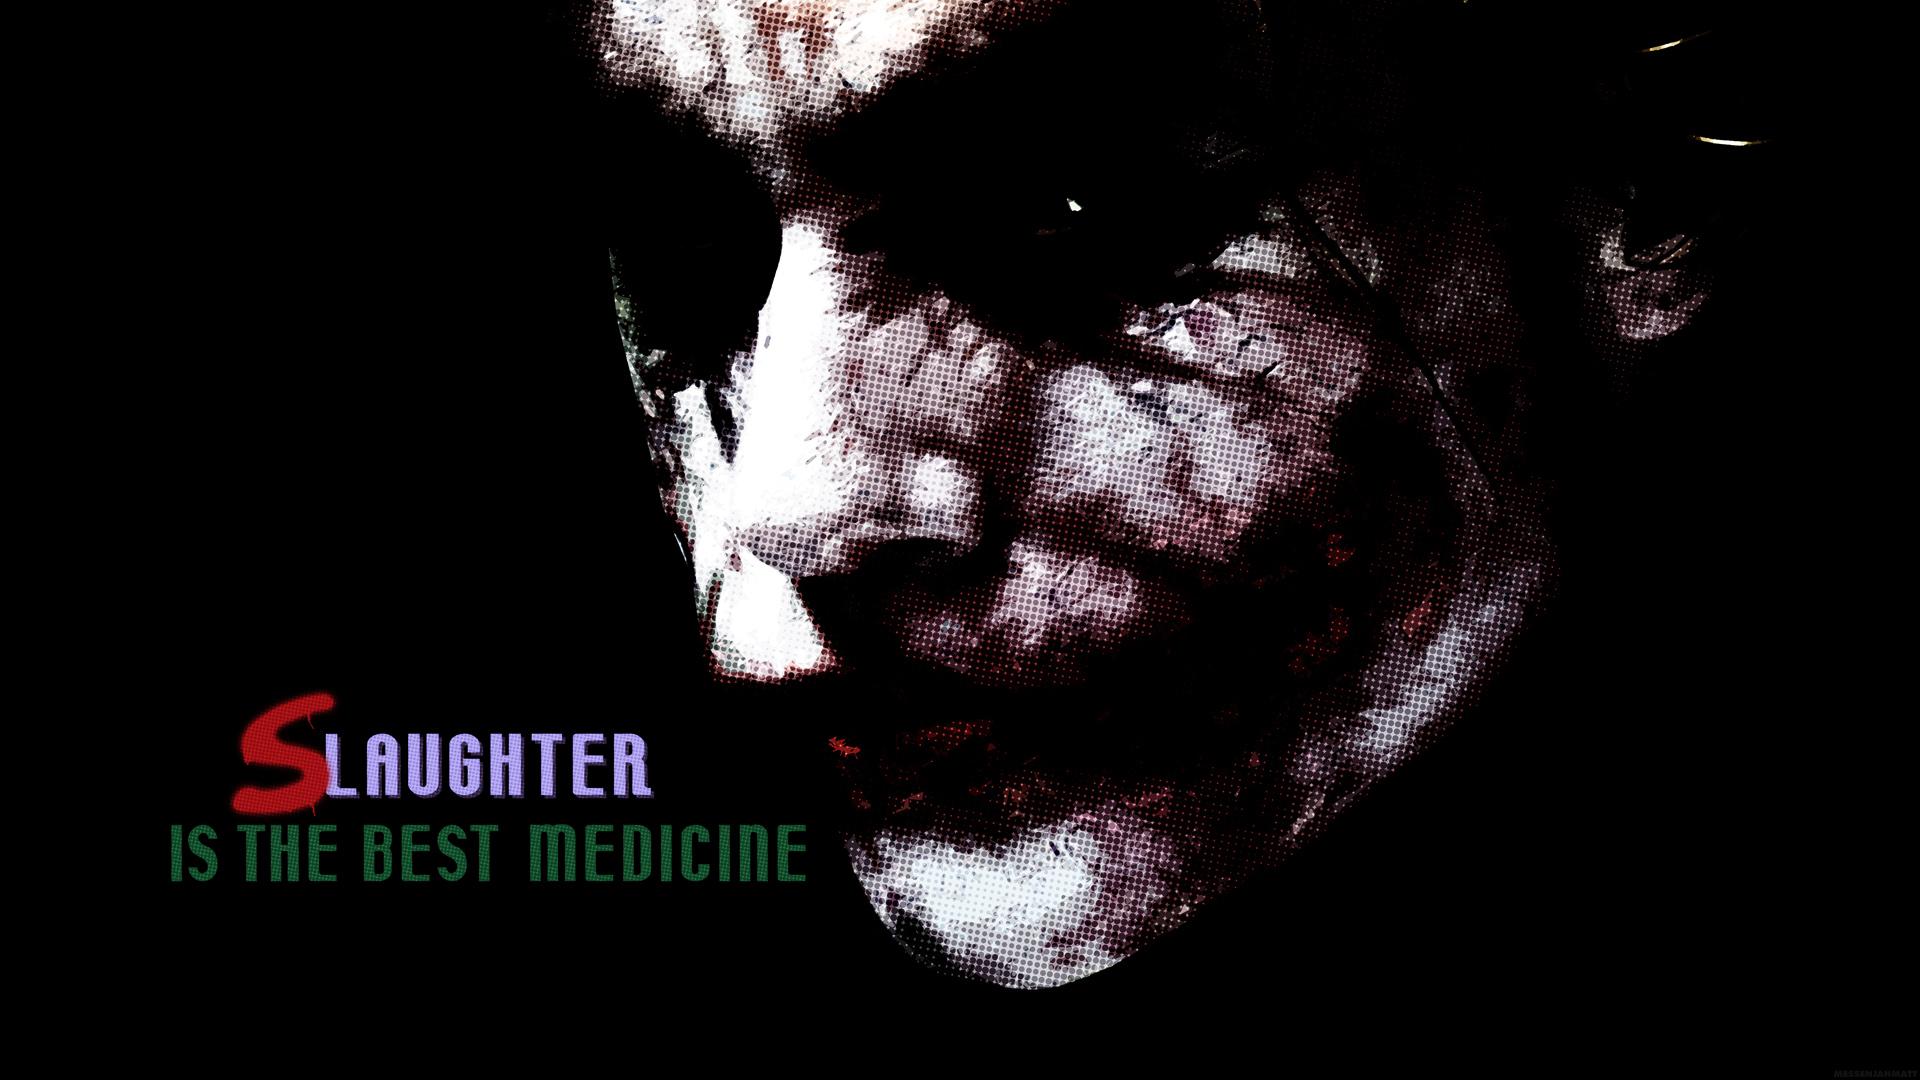 Dark Theme Wallpaper Hd Quote The Joker Images Joker Hd Wallpaper And Background Photos